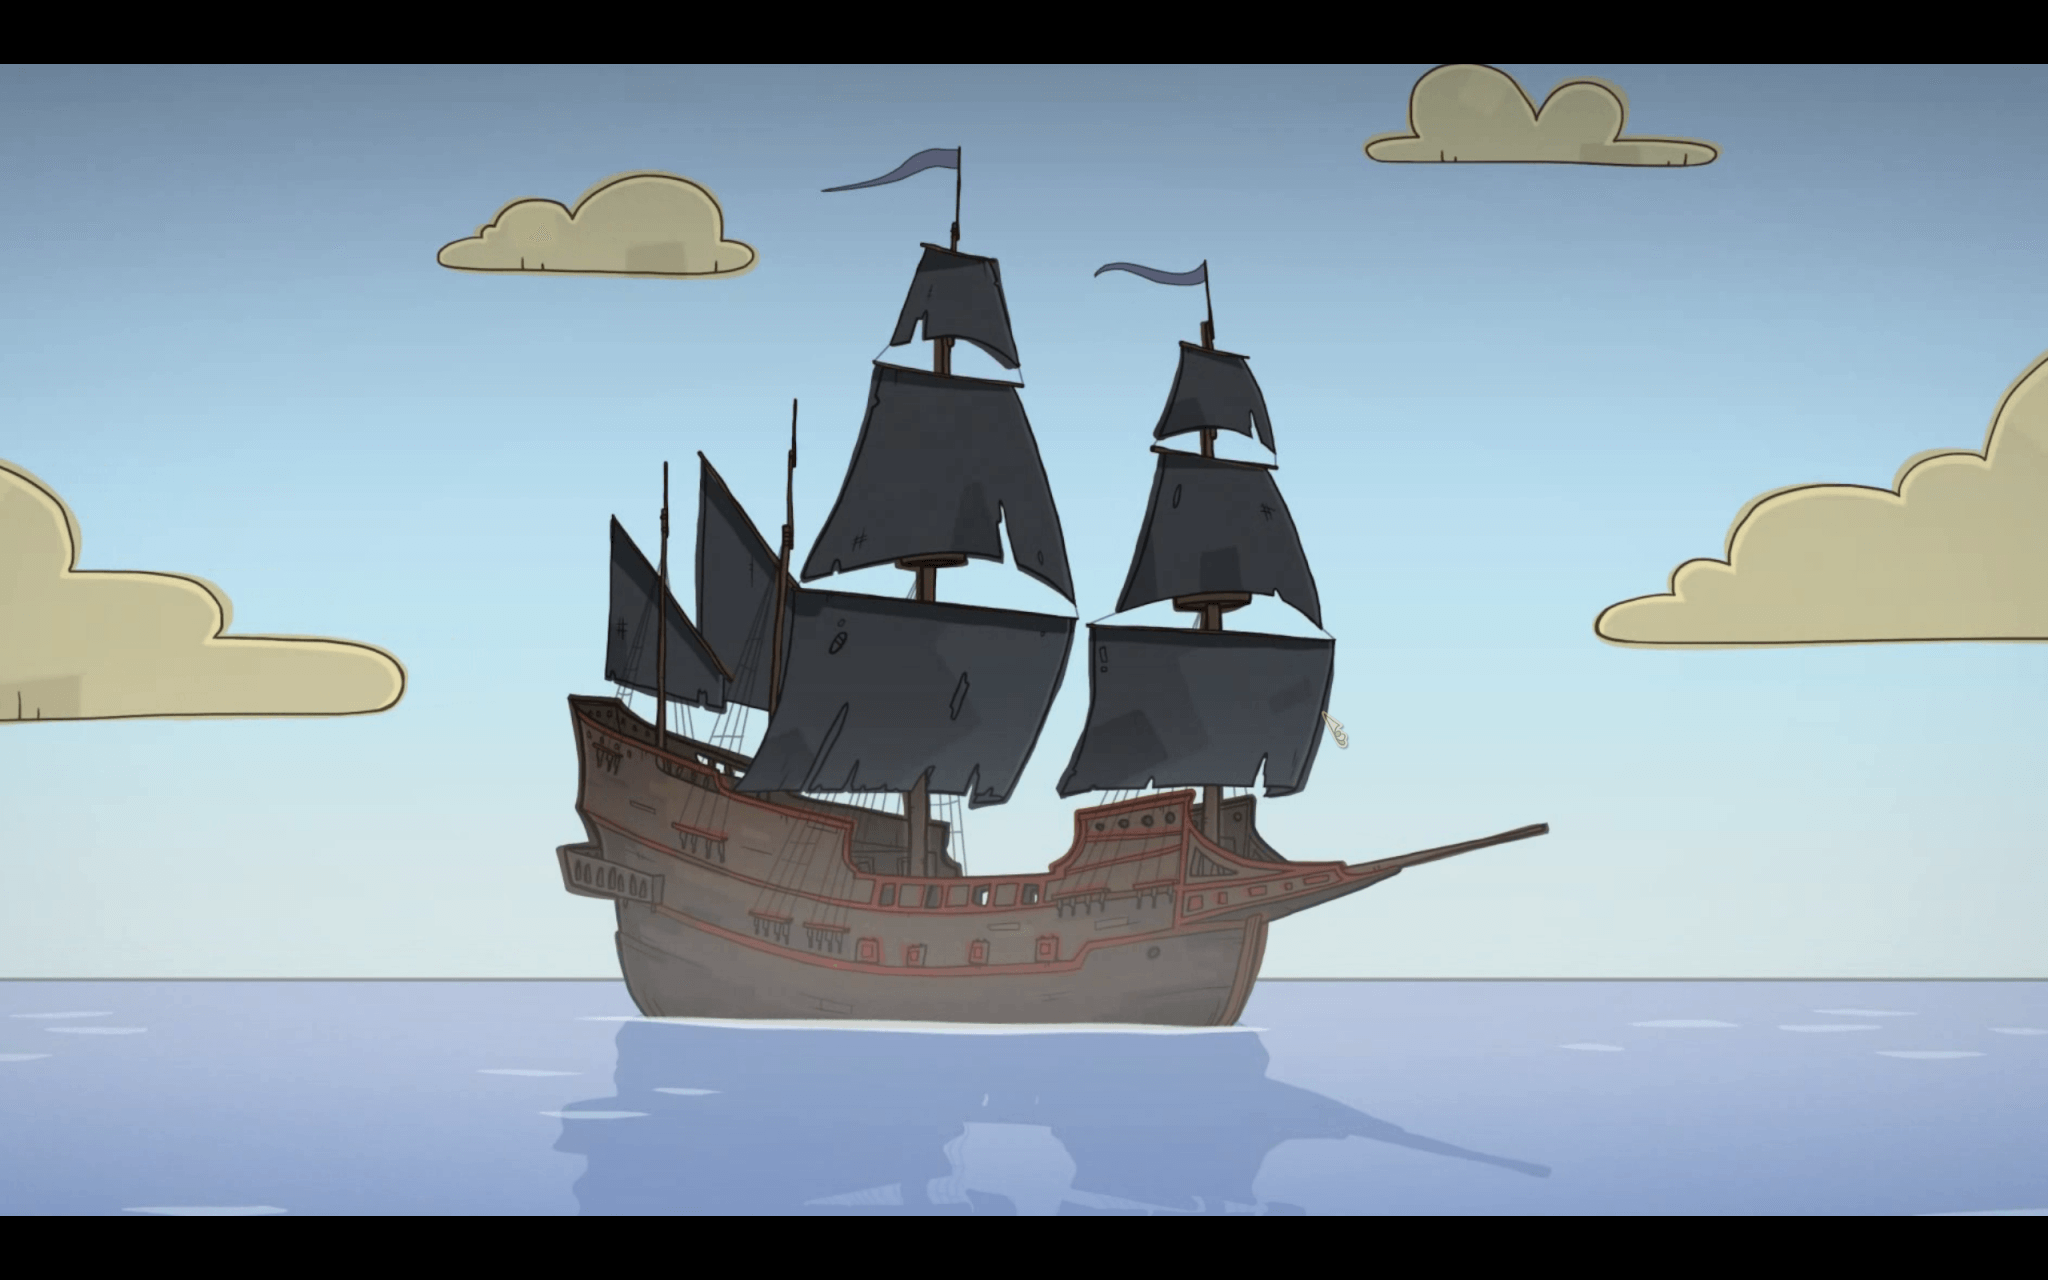 Nelly Cootalot: Schiffe gibt's auch